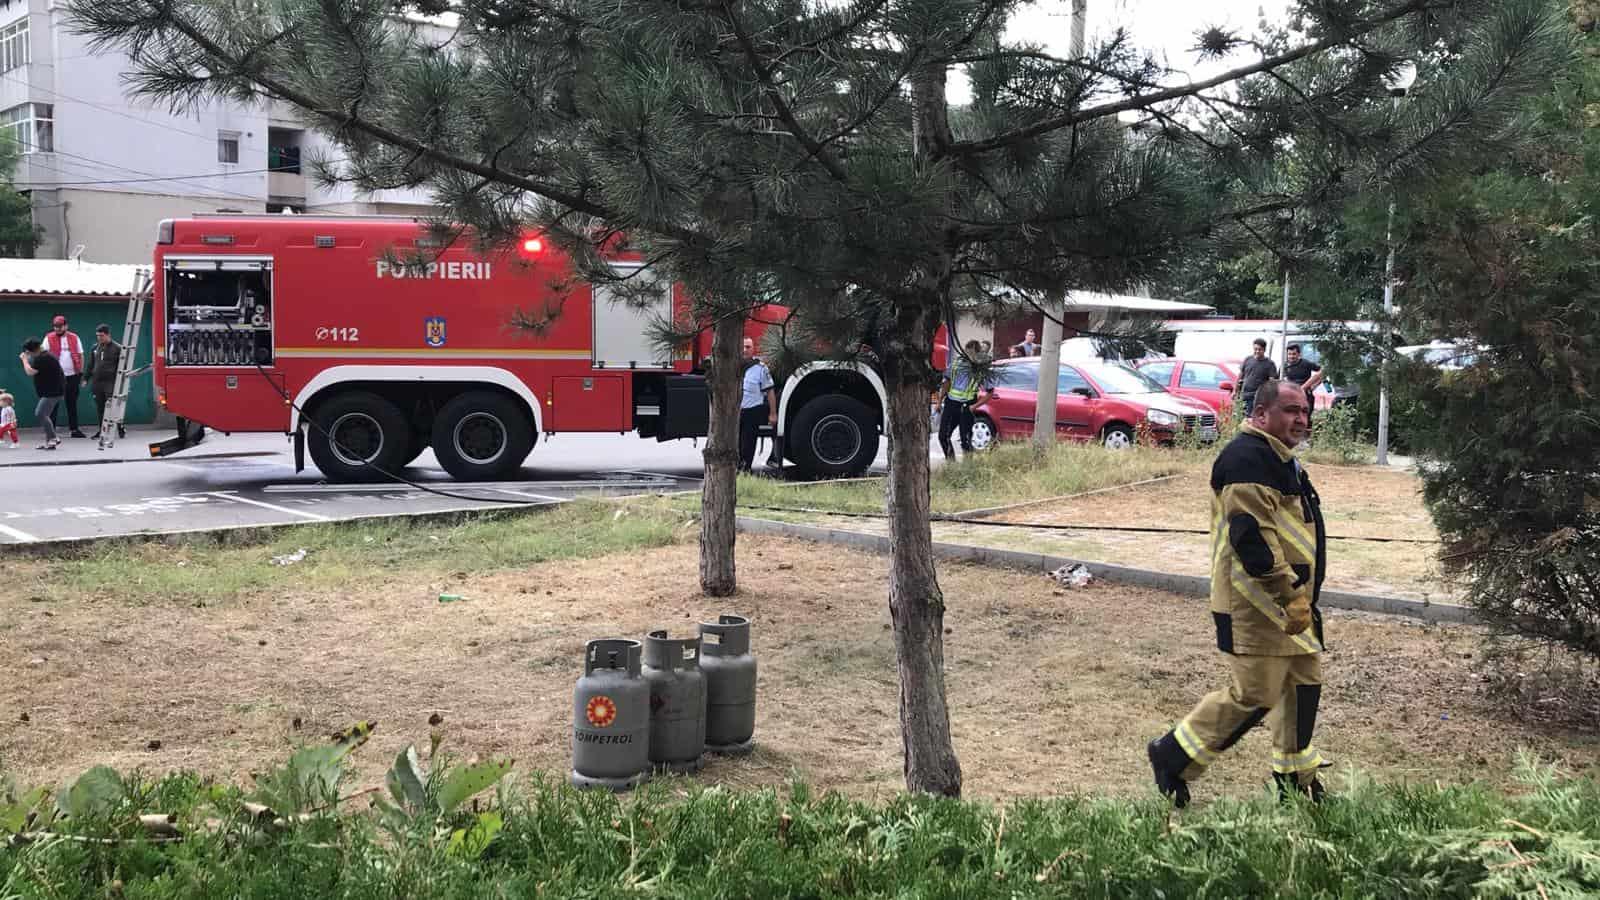 pompieri medgidia2